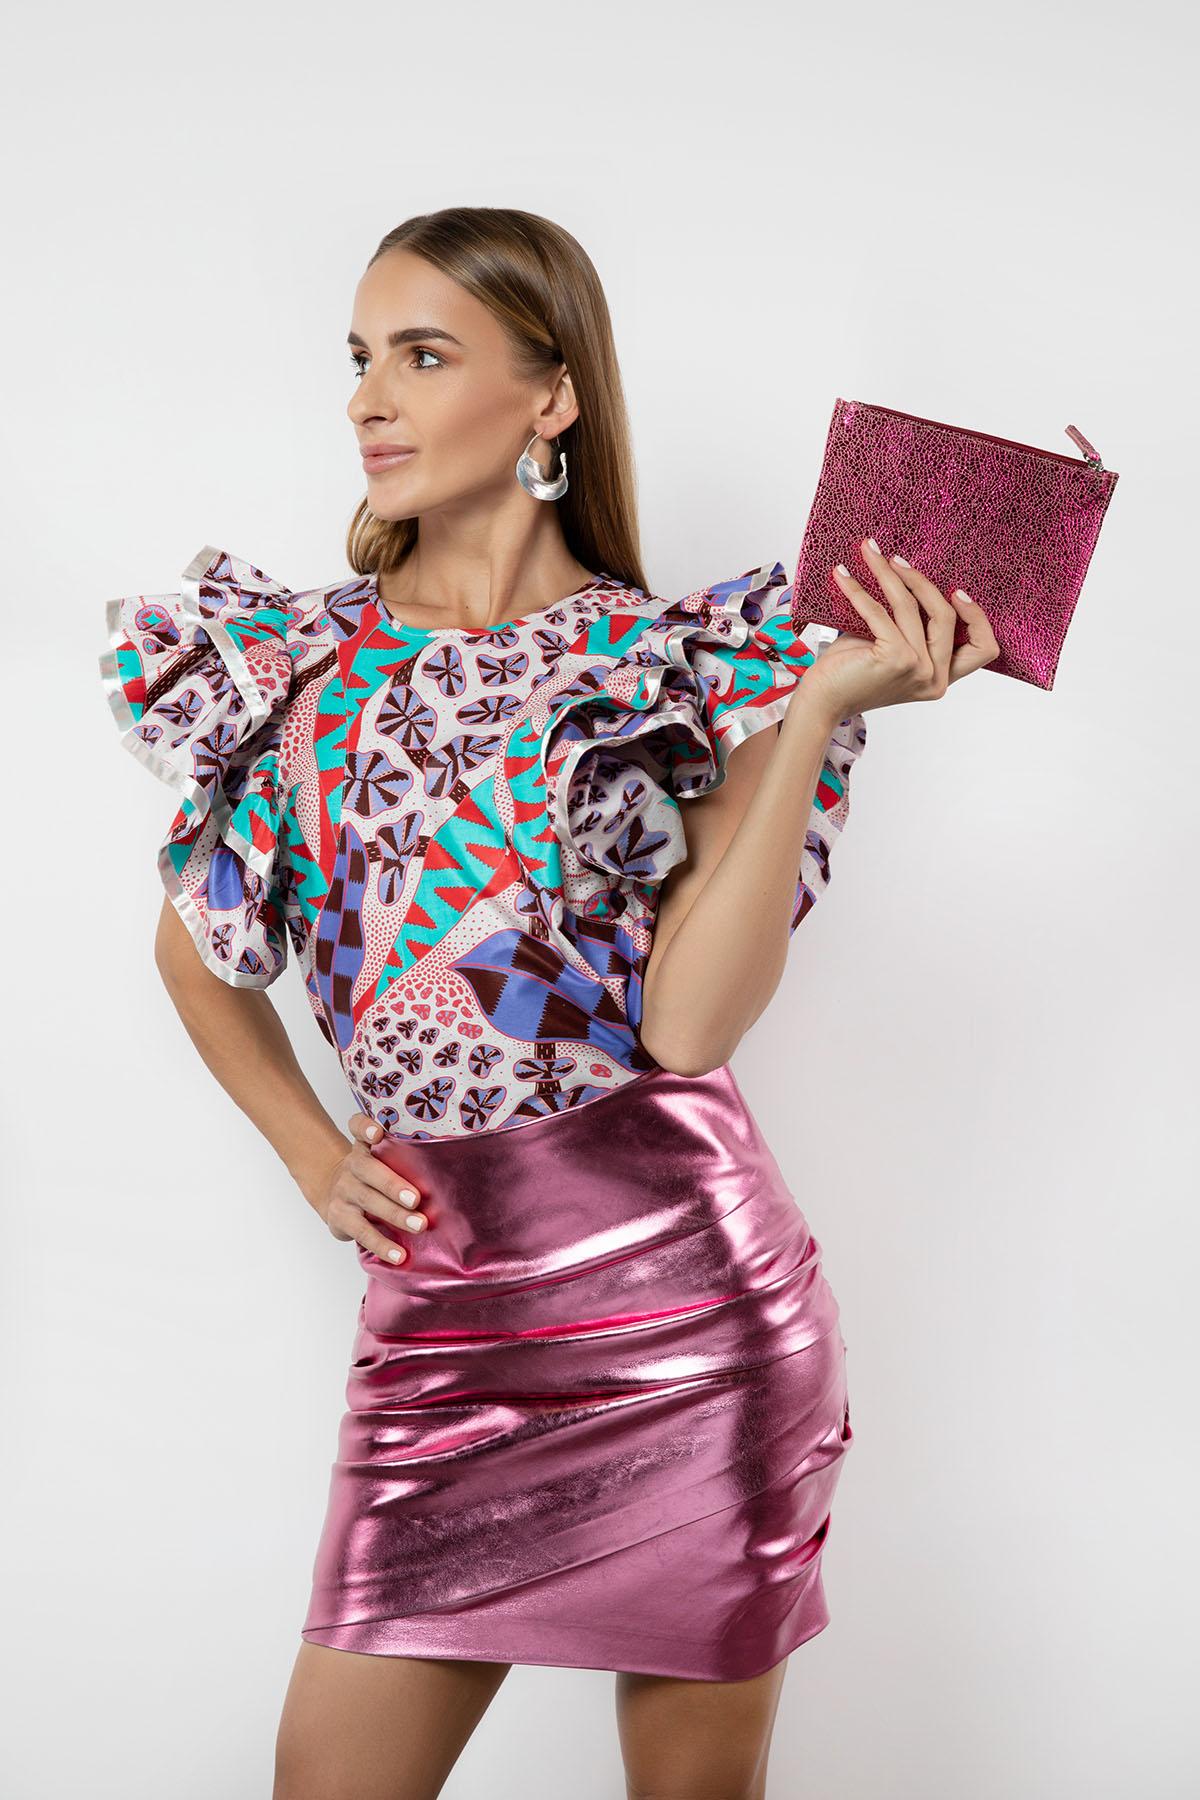 Lookbook shoot with Katrina by Loesje Kessels Fashion Photographer Dubai